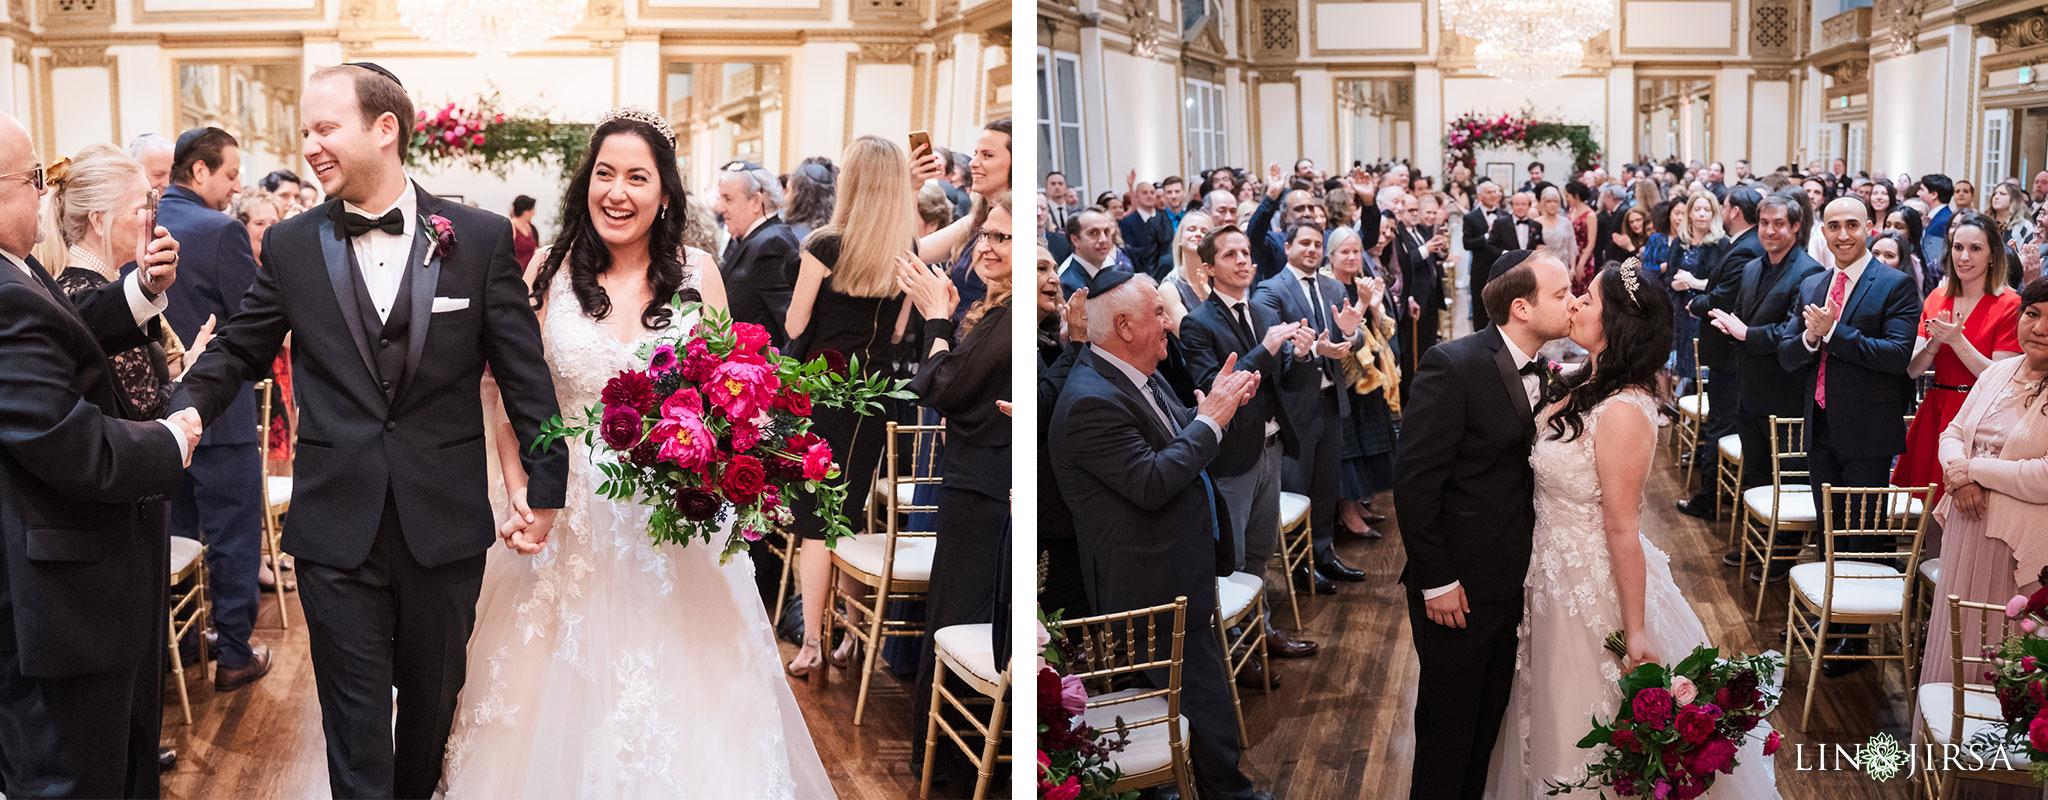 20 Alexandria Ballrooms Los Angeles Jewish Wedding Photography